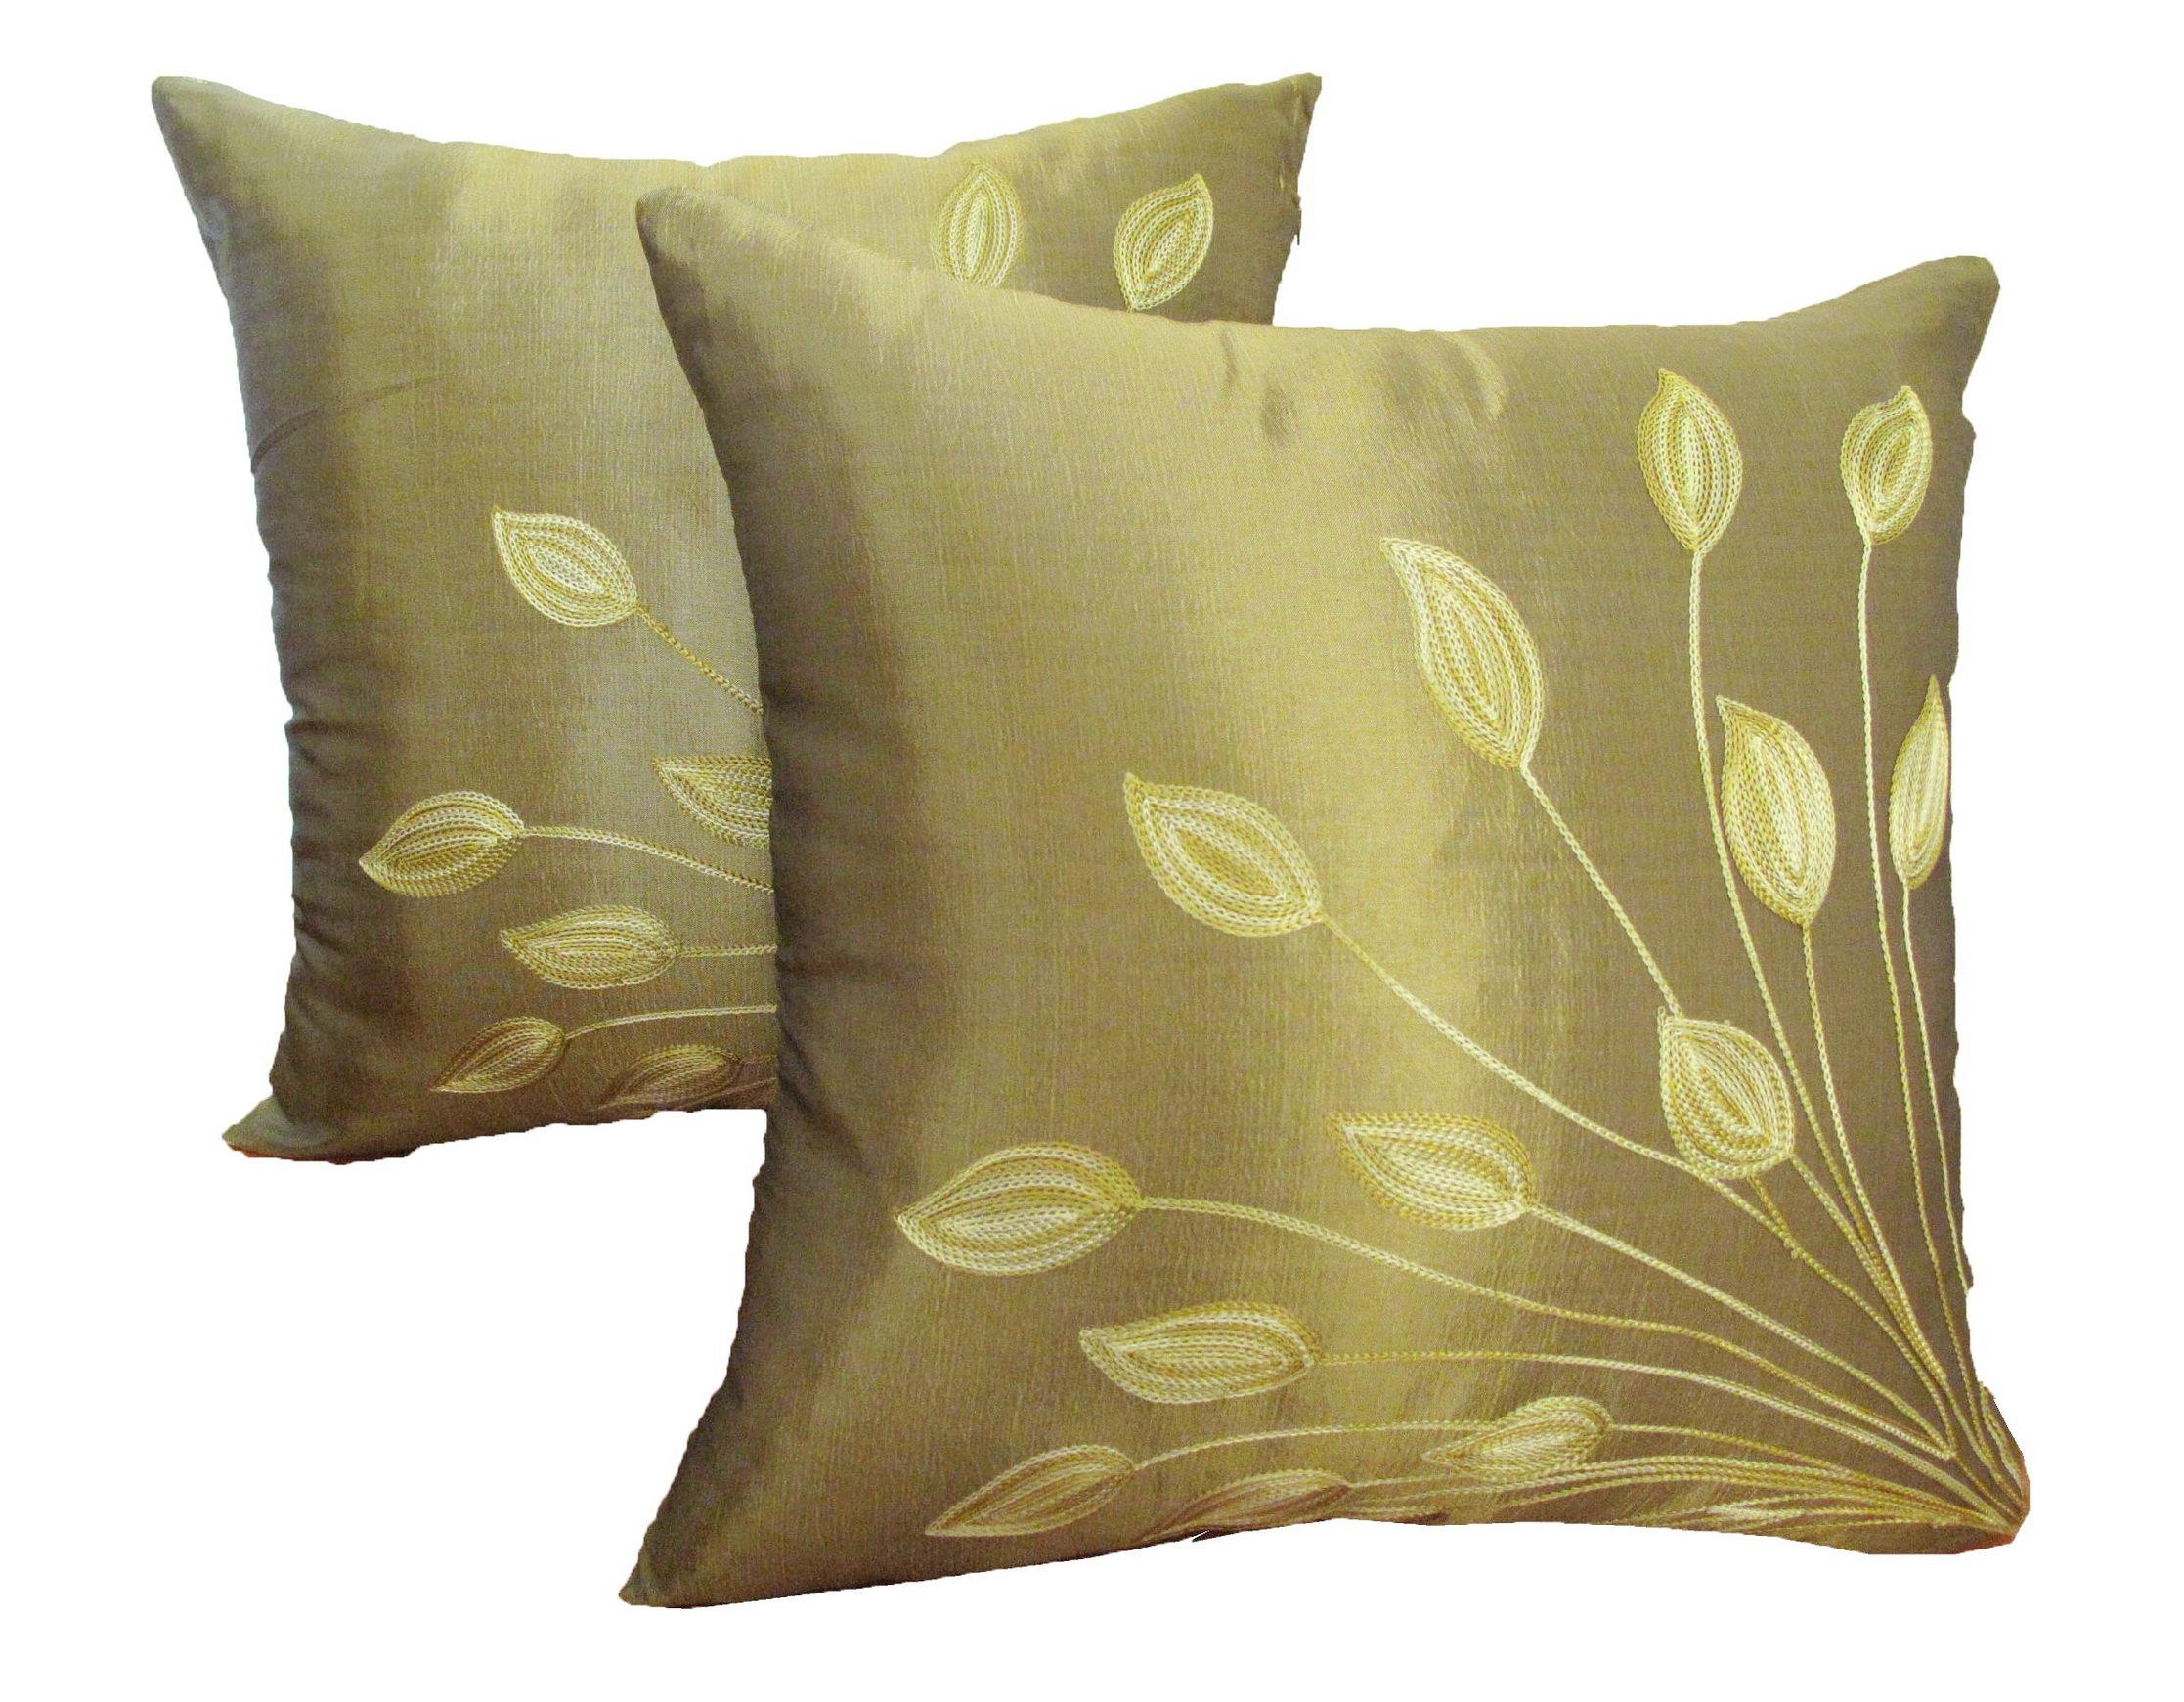 Decorative Thai Silk Throw Pillow Cover Cushion Case Handmade Toss Pillowcase with Hidden Zipper Closure 17 X 17 Inches (For Living Room, Sofa, Etc)